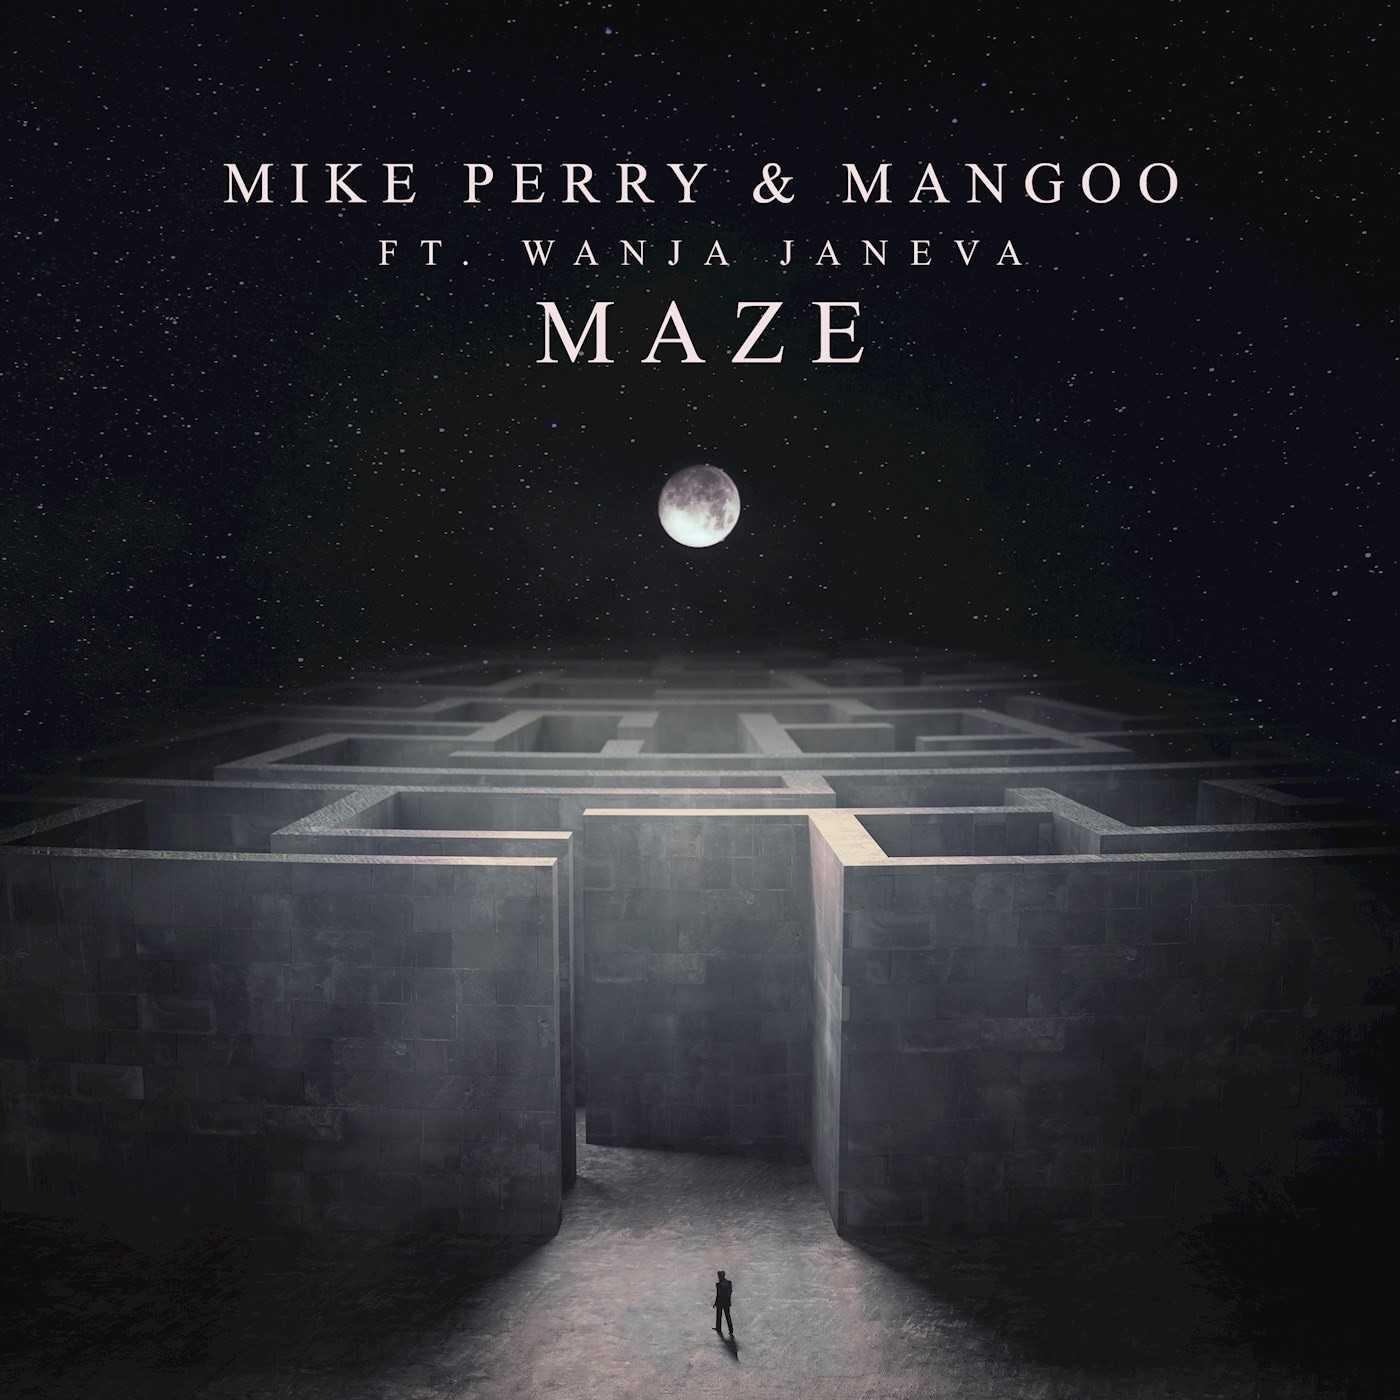 Mike Perry & Mangoo Ft. Wanja Janeva - Maze